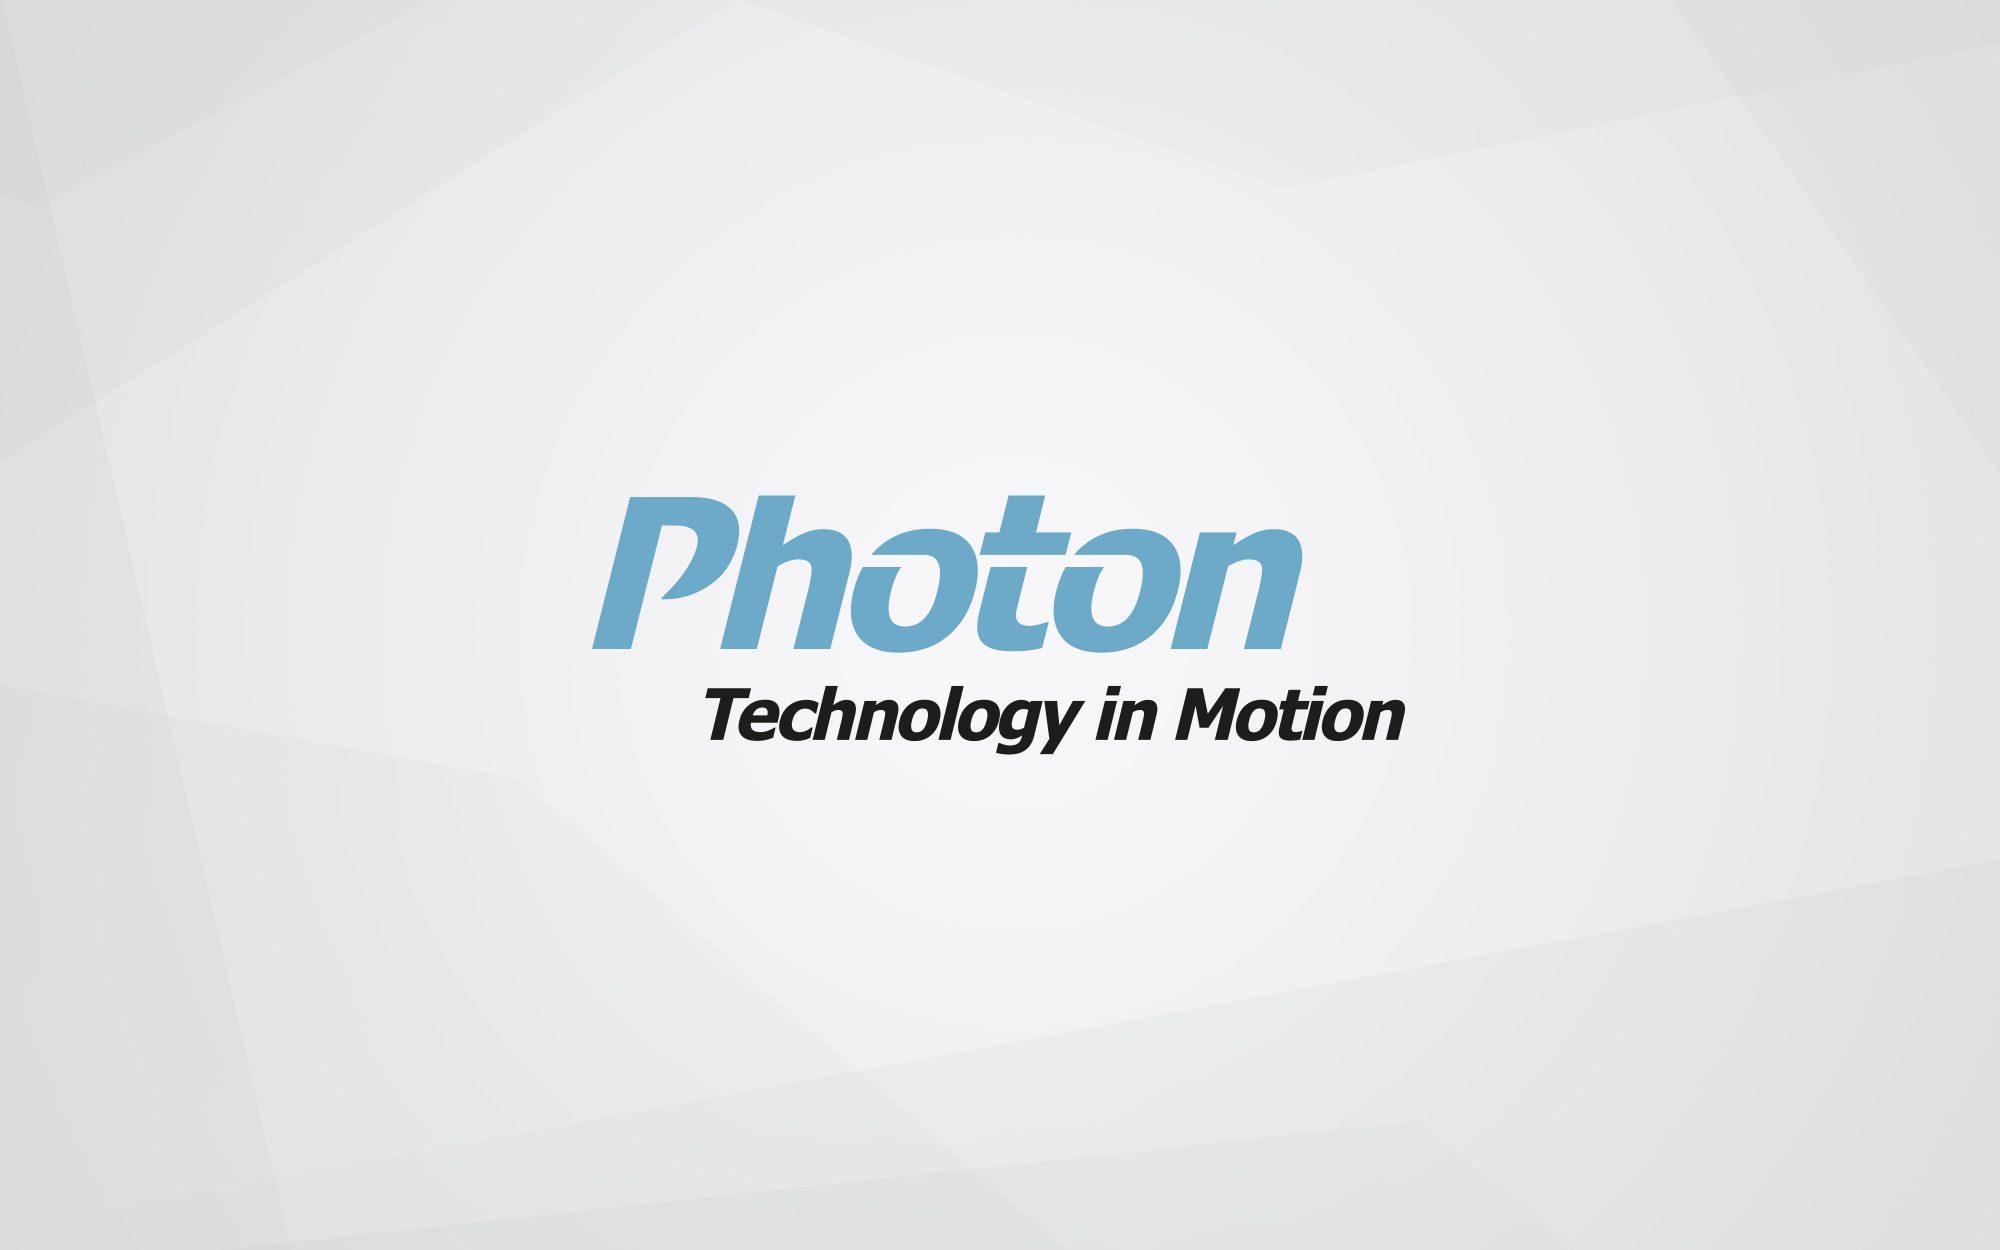 GRACO-PhotonAG-Logo-Technology-in-Motion